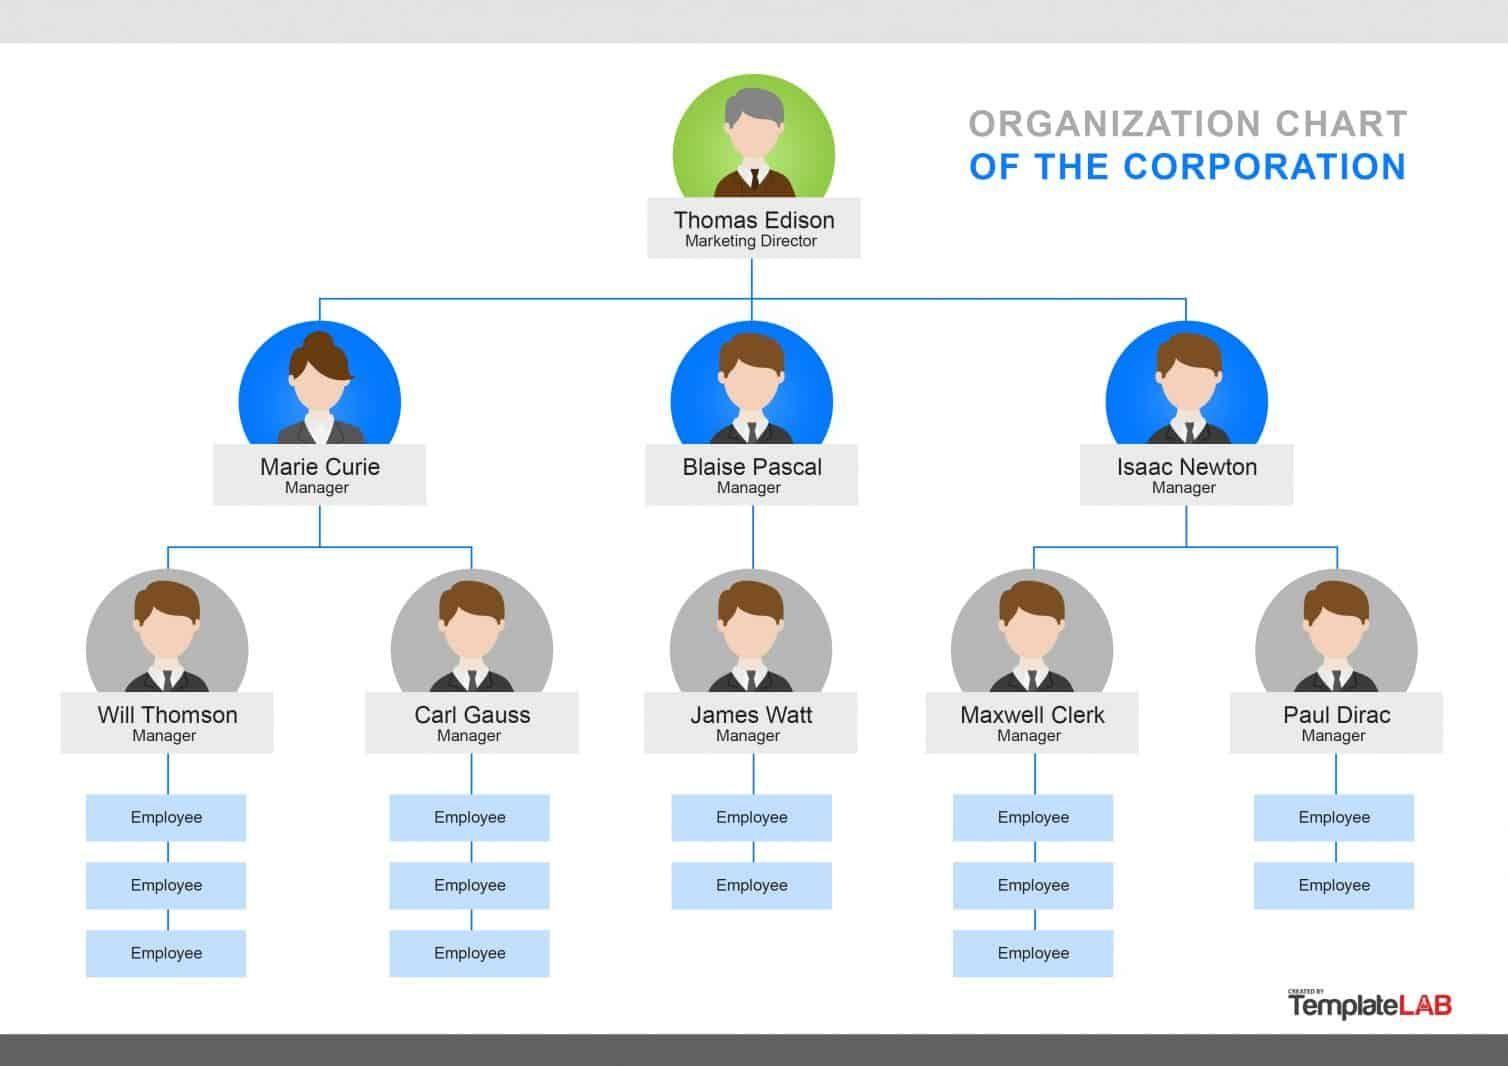 000 Impressive Microsoft Organizational Chart Template High Def  Templates Visio Org M Office Organization PowerpointFull